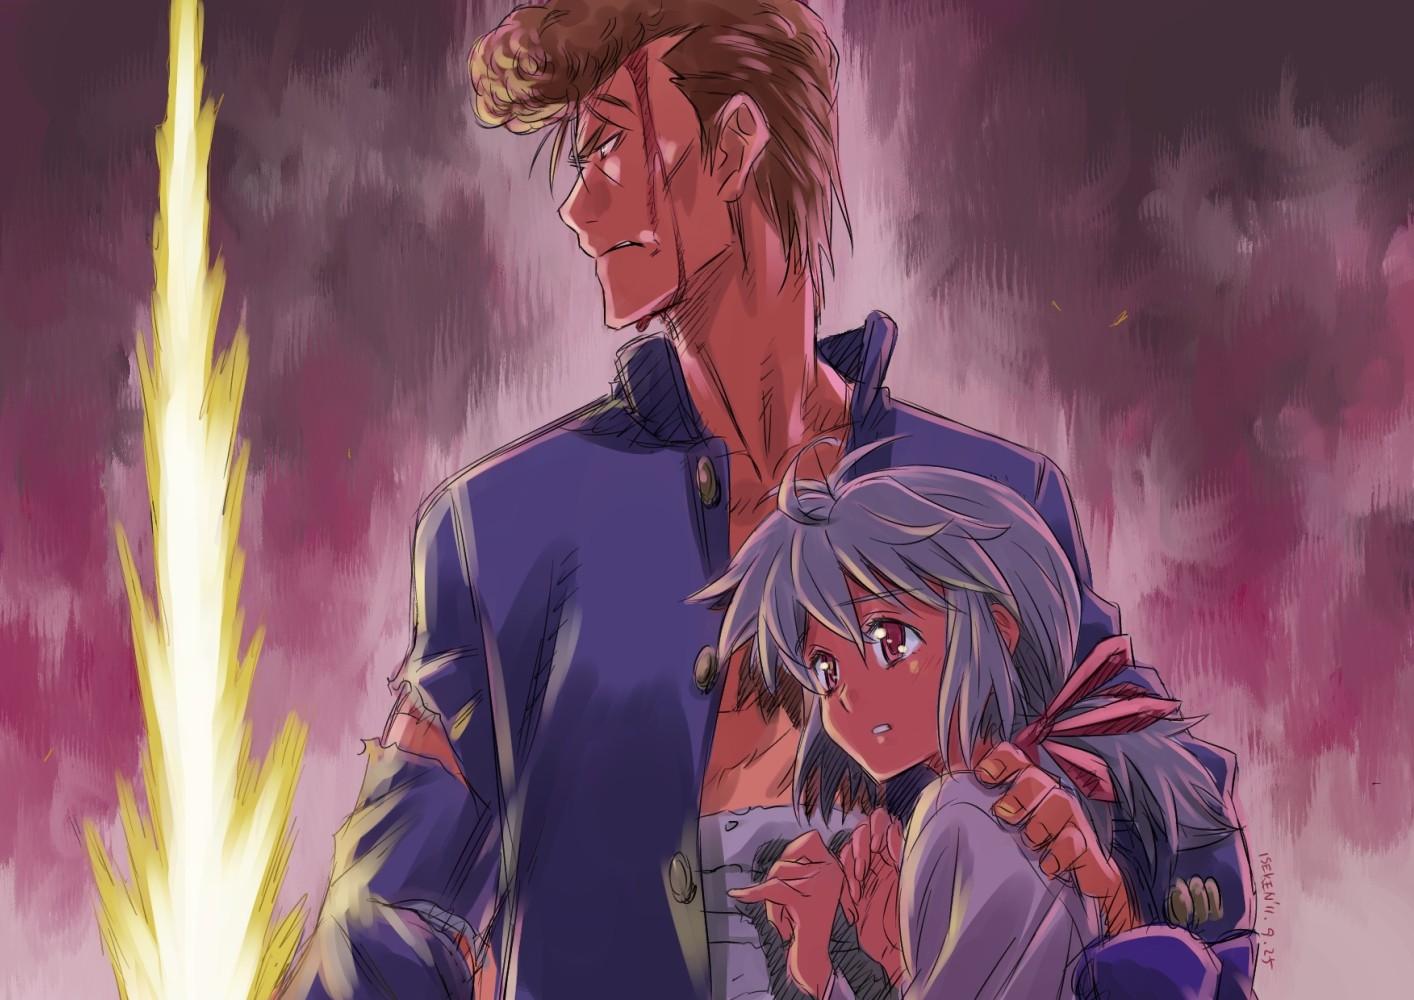 Wallpaper Illustration Anime Yu Yu Hakusho Screenshot